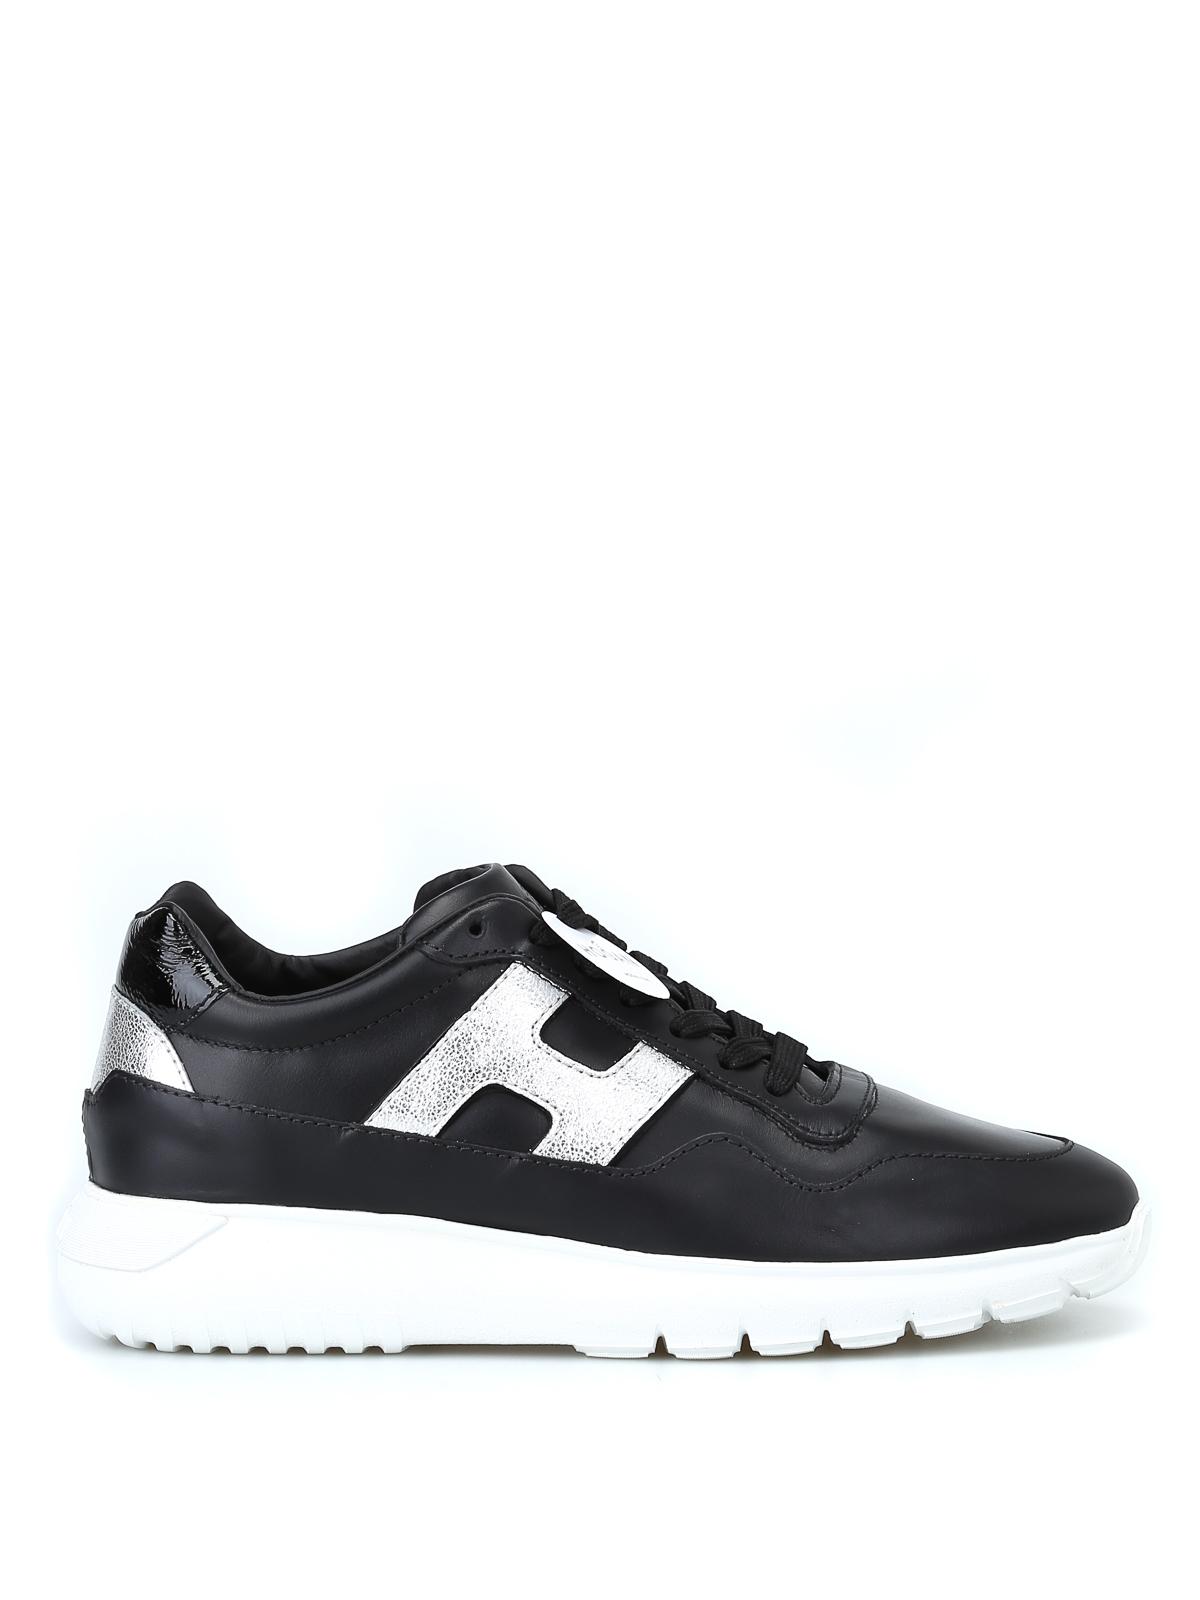 Sneakers Hogan - Sneaker Interactive³ nere e argento ...